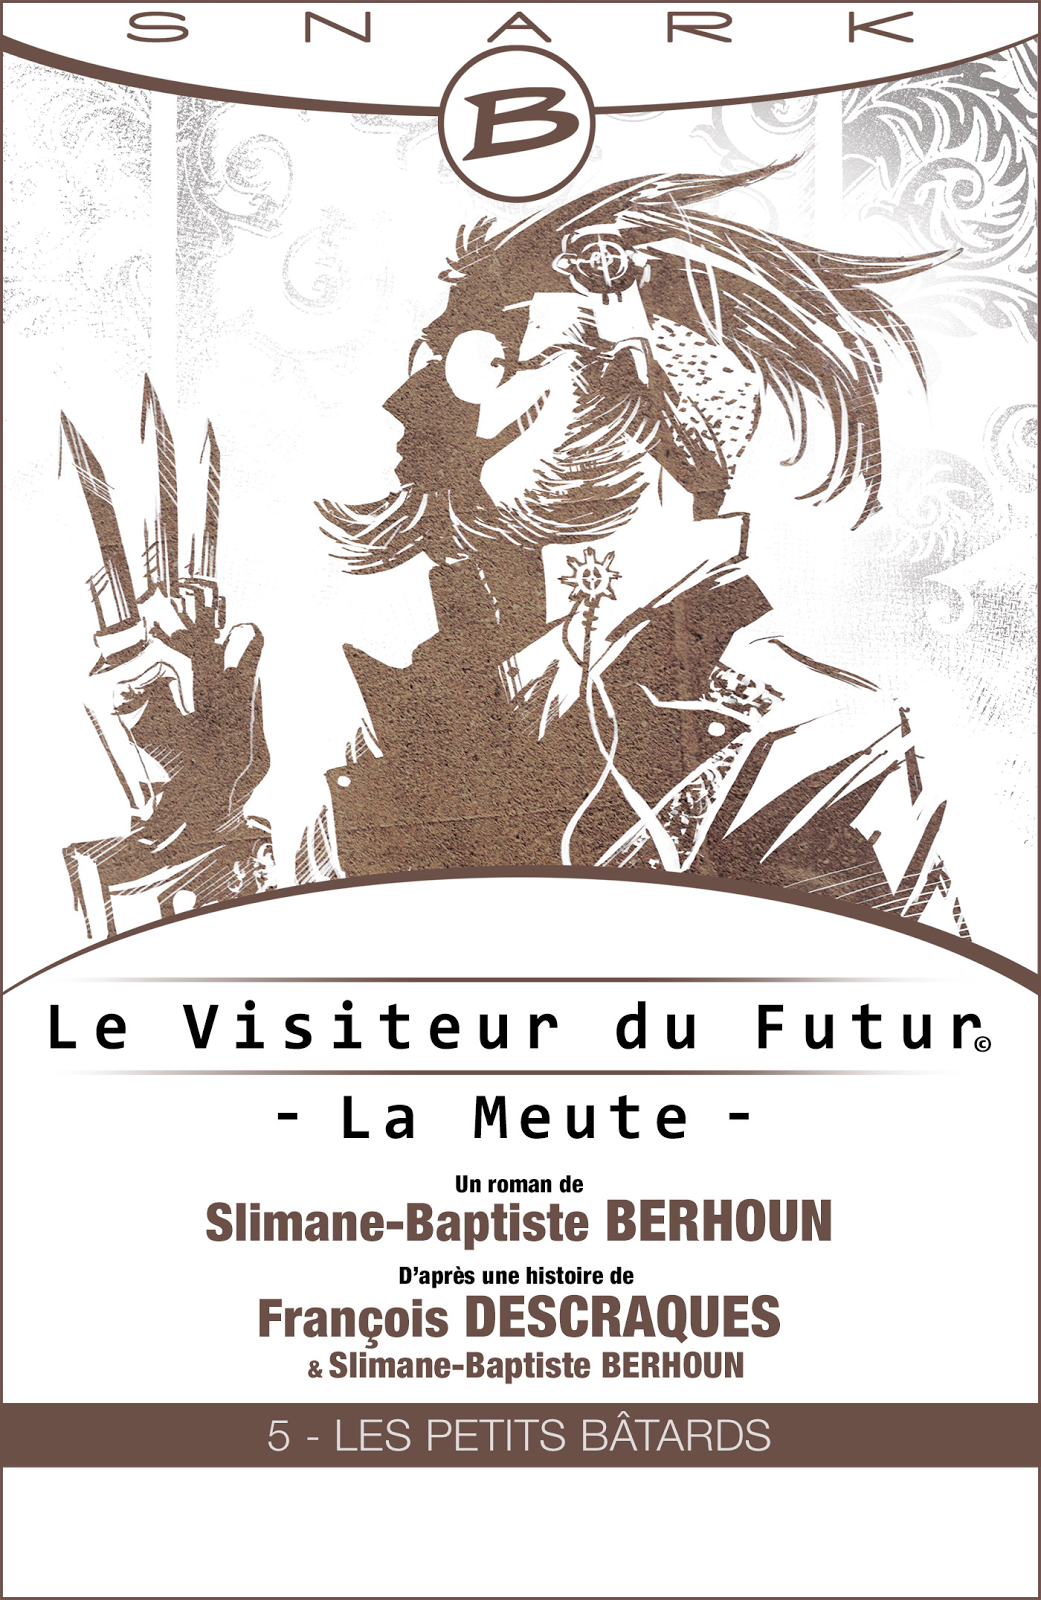 http://regardenfant.blogspot.be/2015/05/les-petits-batards-de-slimane-baptiste.html